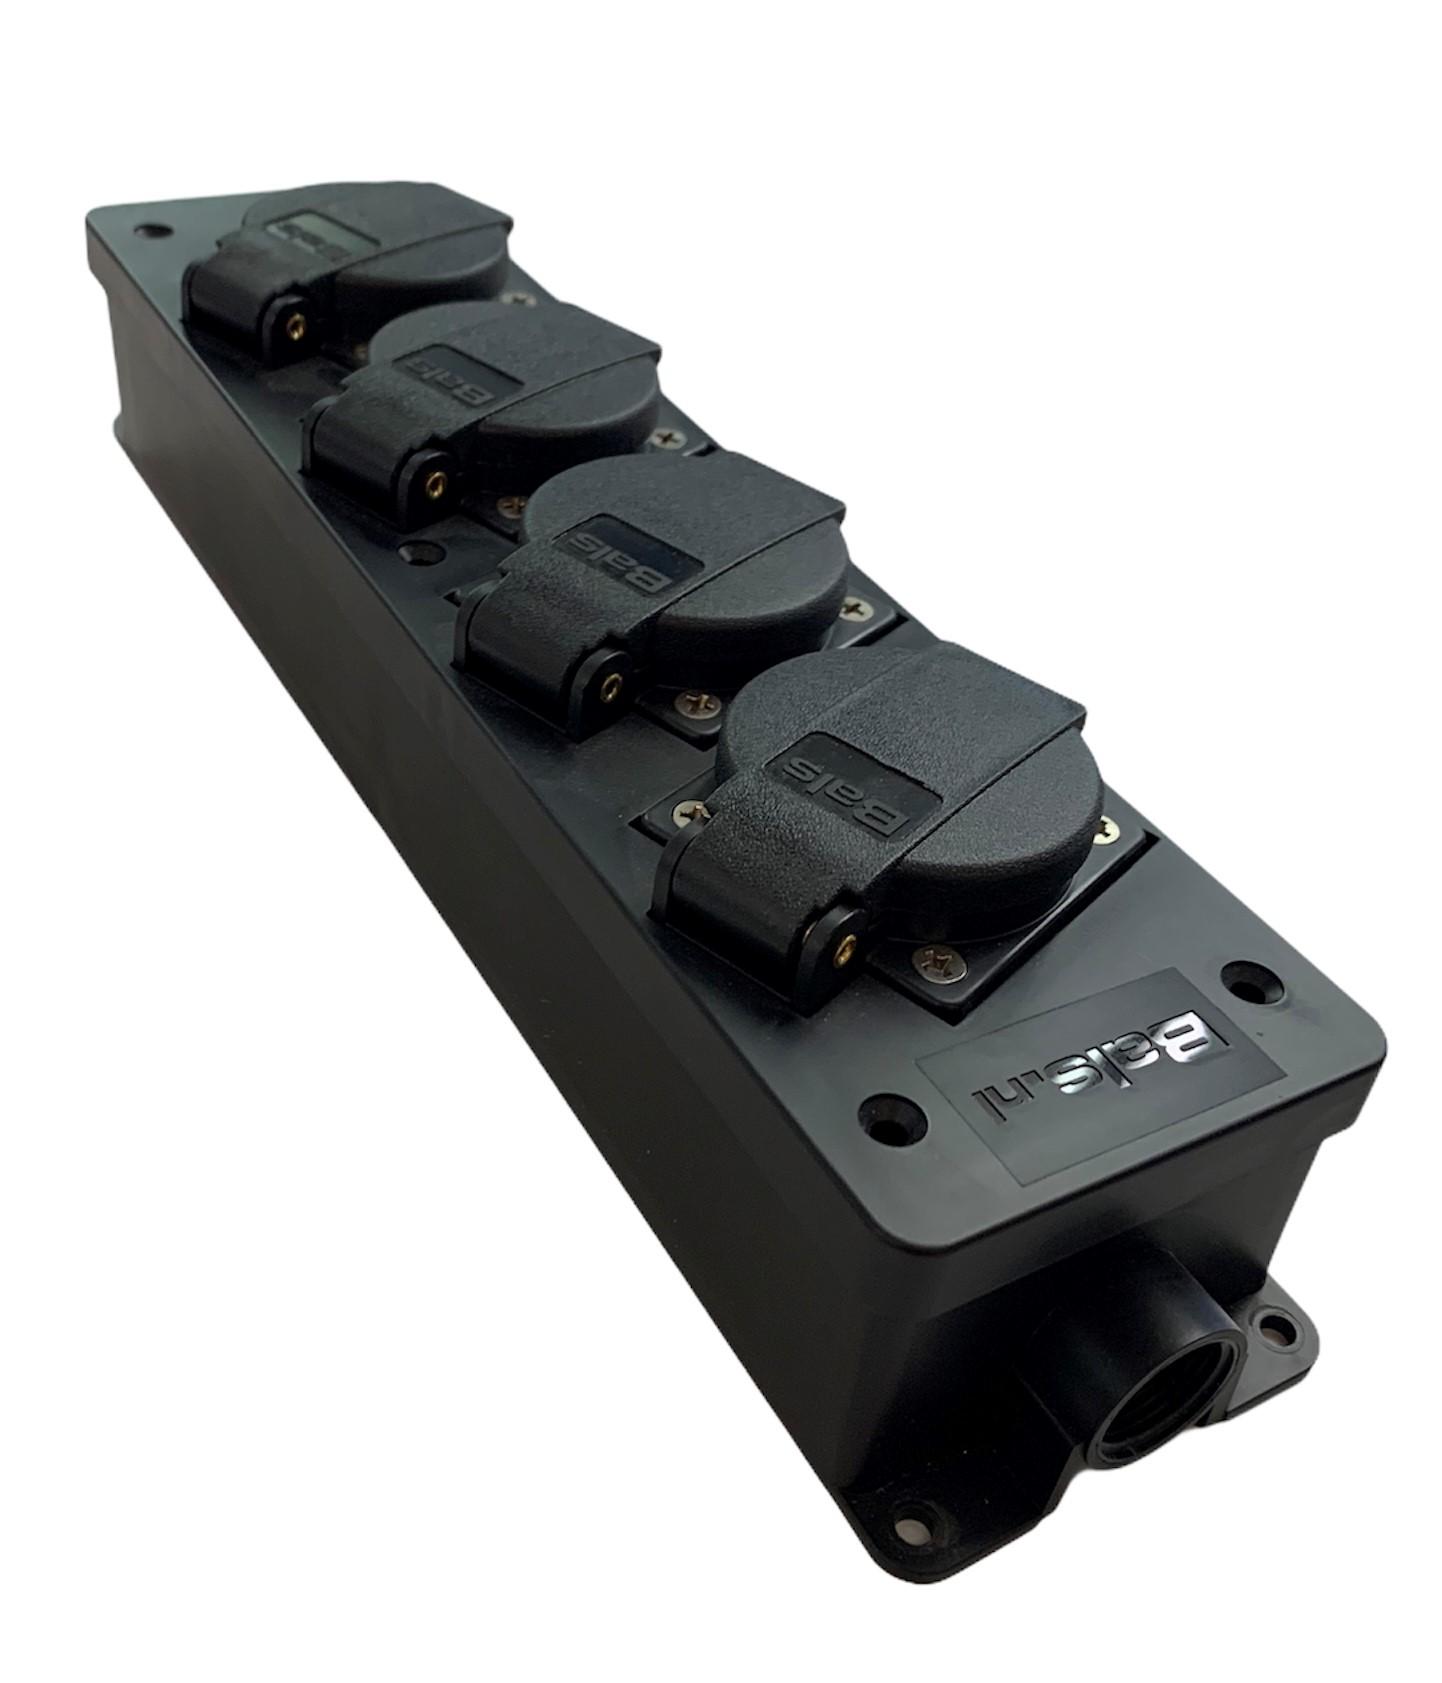 Bals-Prd.-NrBT700011                                                                                                                                     Verdeelslof 16A Bals 14 Zwart 4-voudig sockets.                                                                                         Solid-Rubber. (system F-German earting system )                                                                                                    Inclusief Wartel en bijbehorende schroeven                                                                                            Lengte  310mm-Breed-72mm-Hoog 50mm